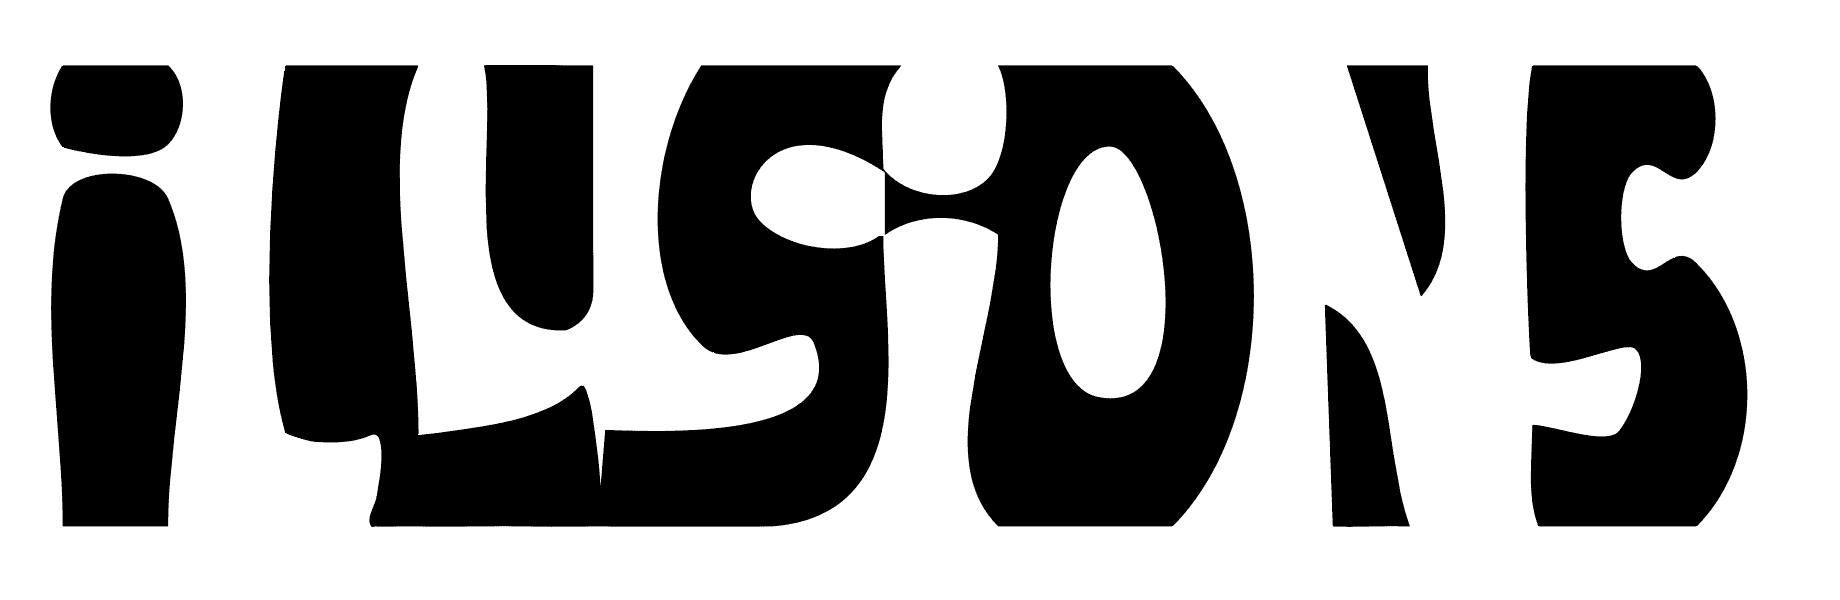 illusion illusions word optical words figure ground designs visual merging langdon inspired ways final john